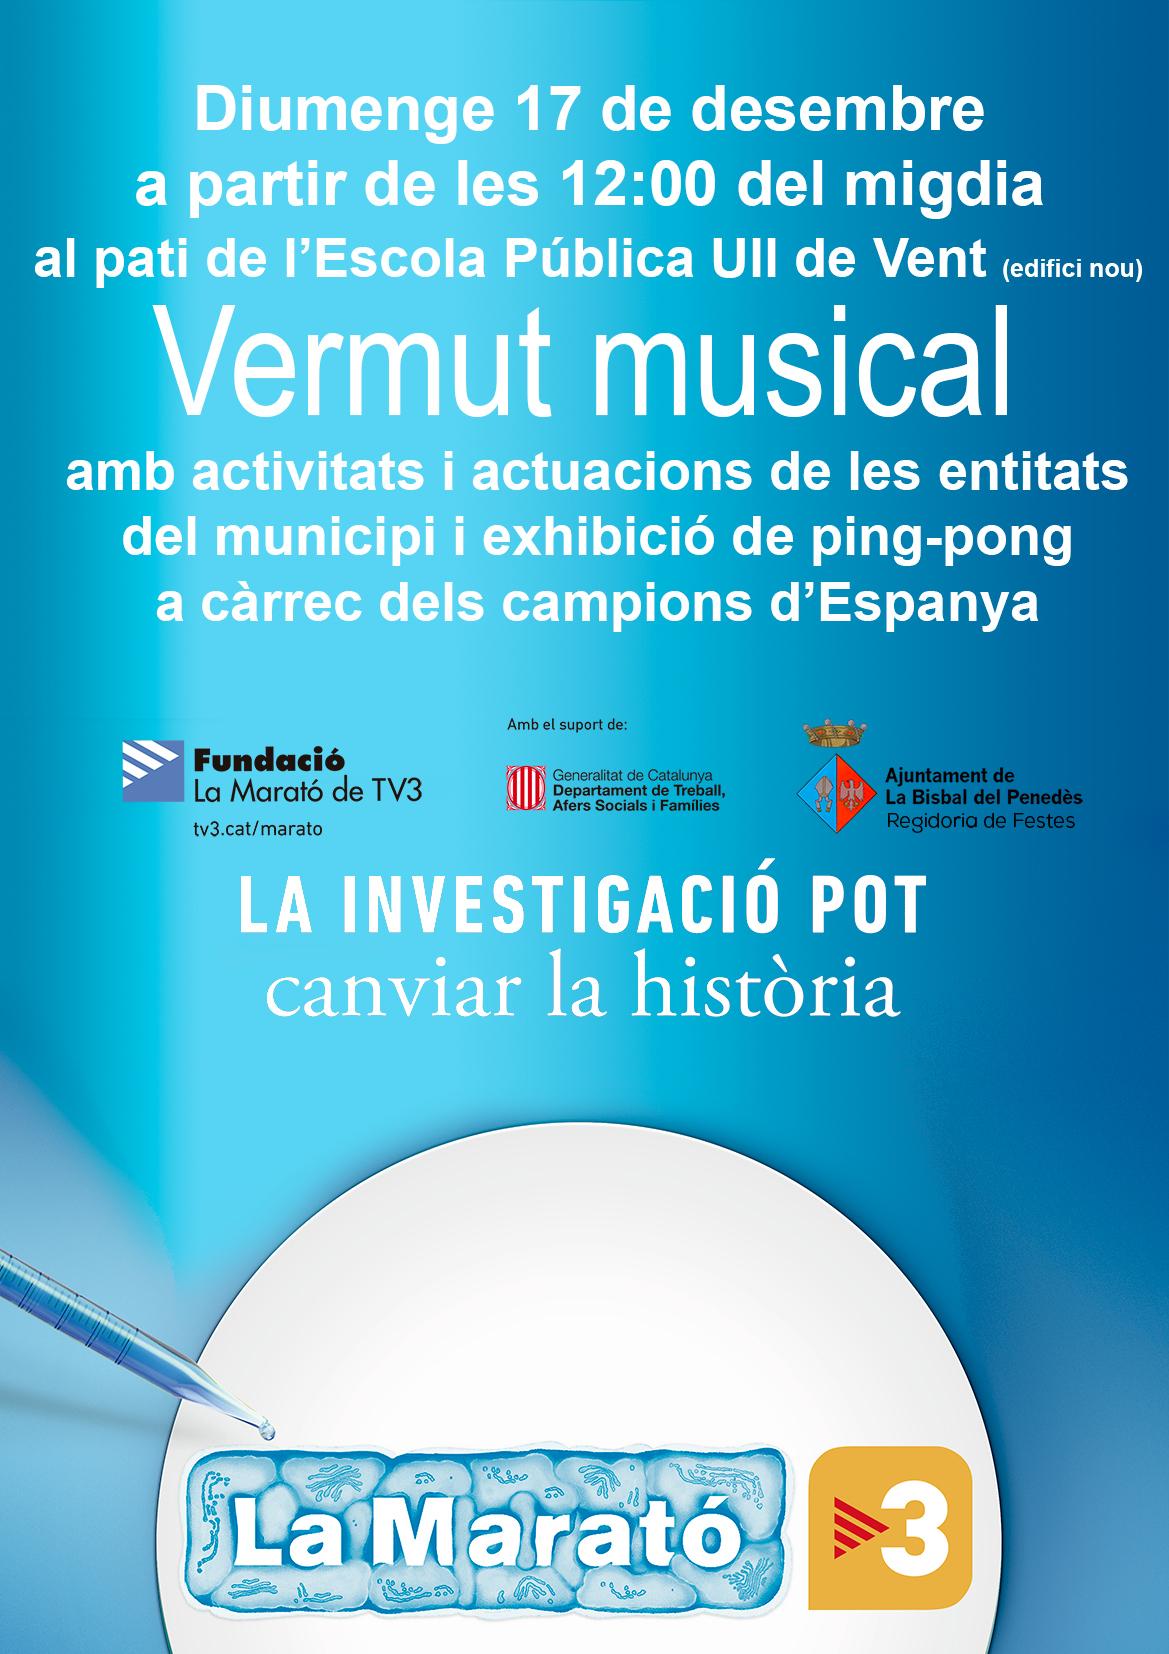 Diumenge 17 de desembre col·labora amb La Marató de TV3 participant al vermut musical